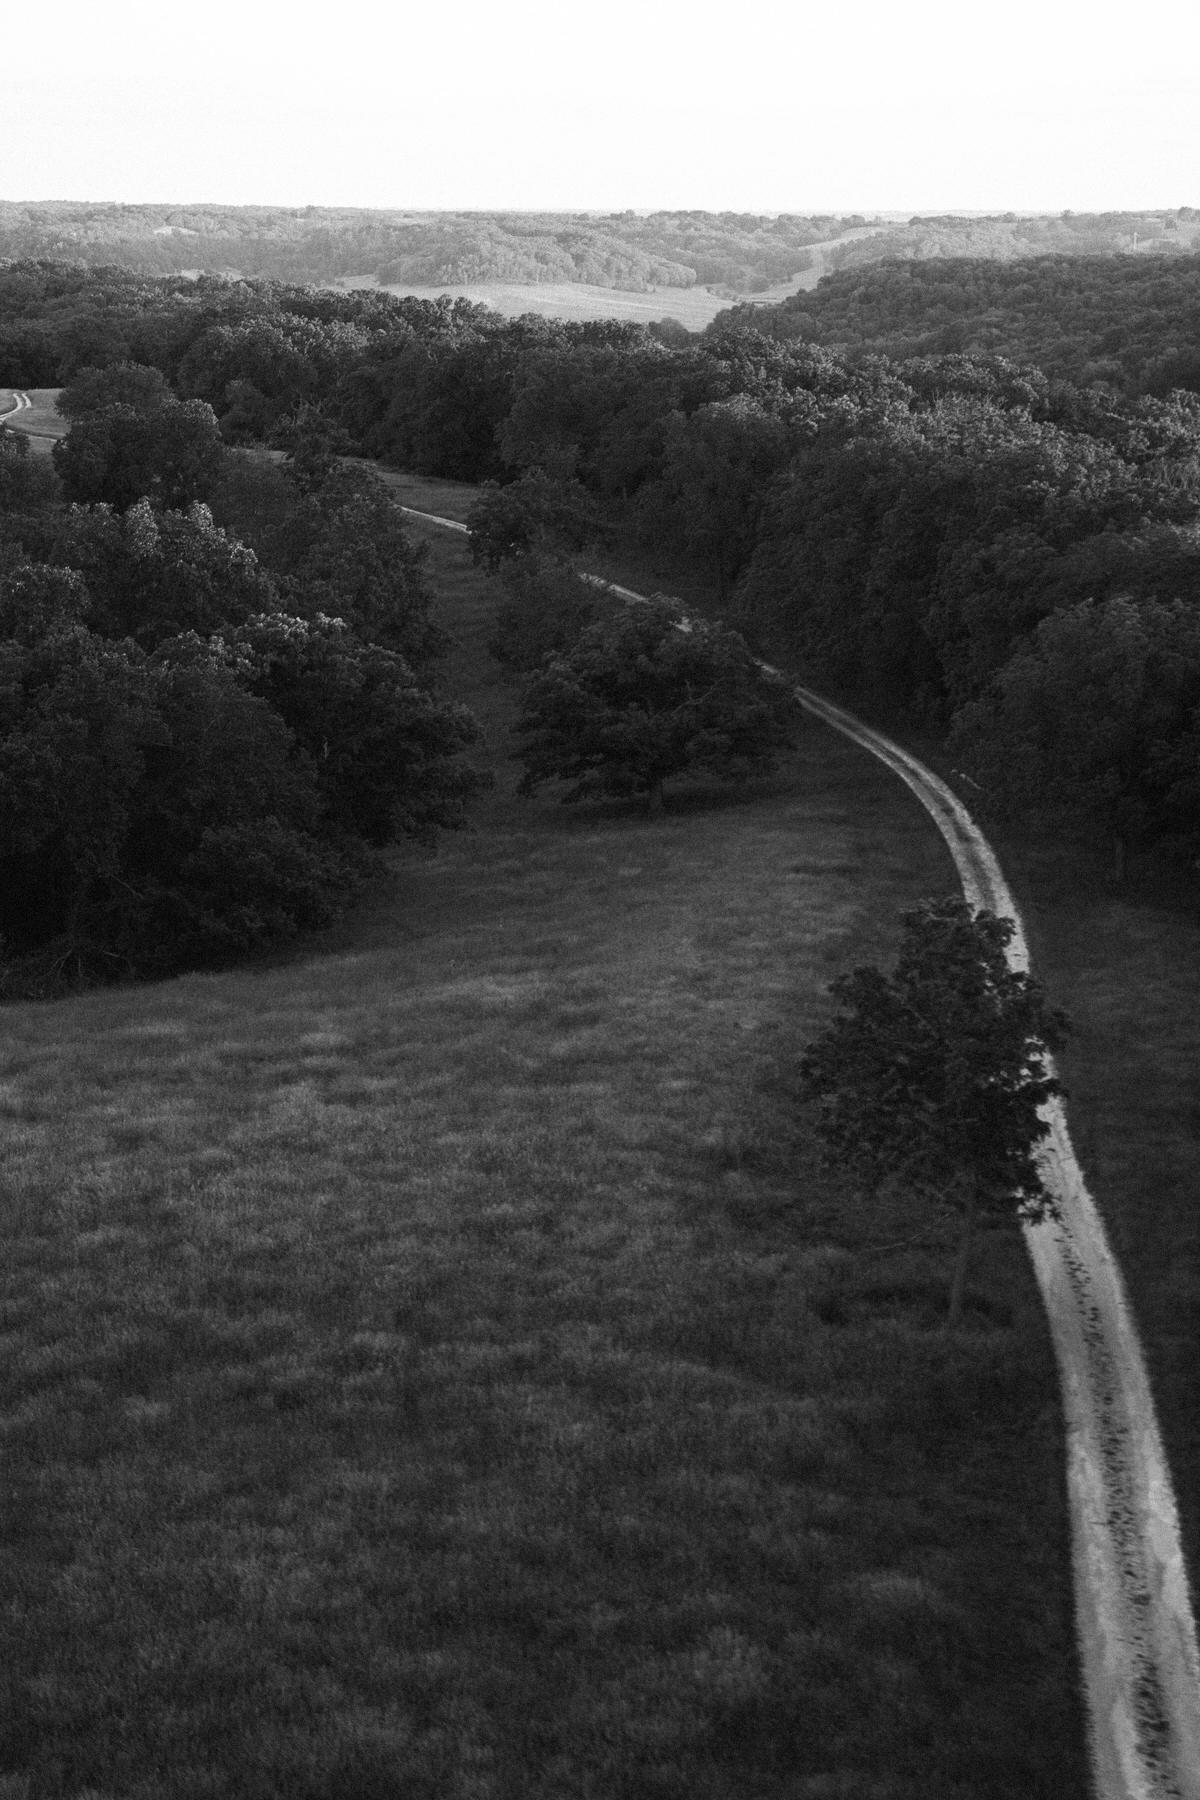 Hot-Air-Balloon-Ride-Galena-Illinois-fine-art-photography-by-Studio-L-photographer-Laura-Schneider-_6165